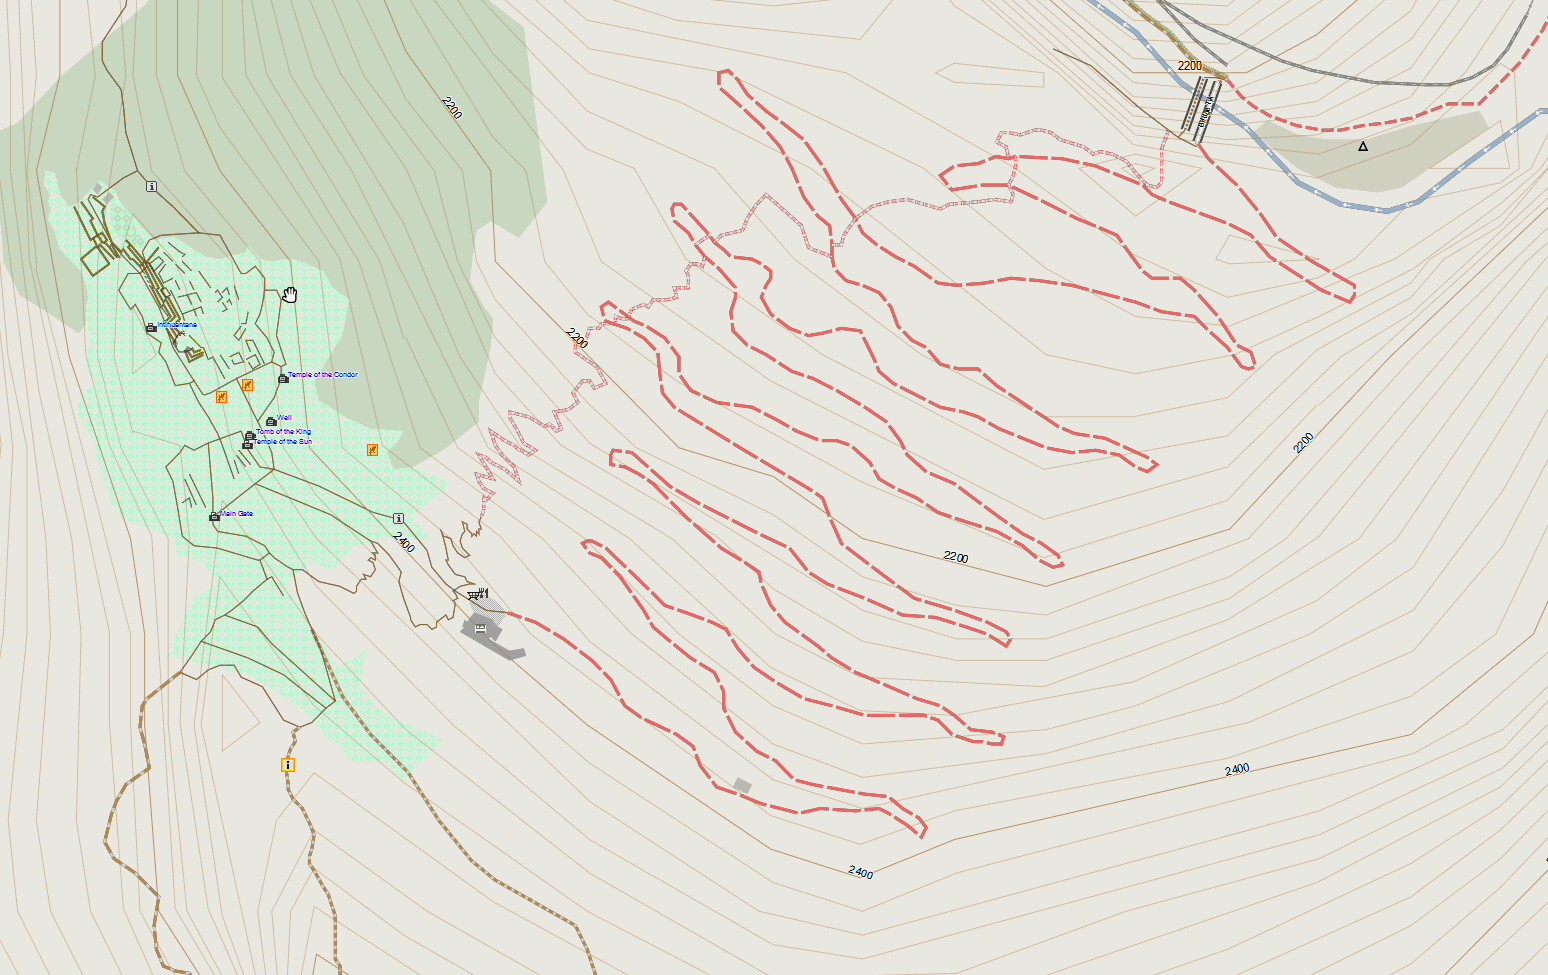 osm map on garmin download